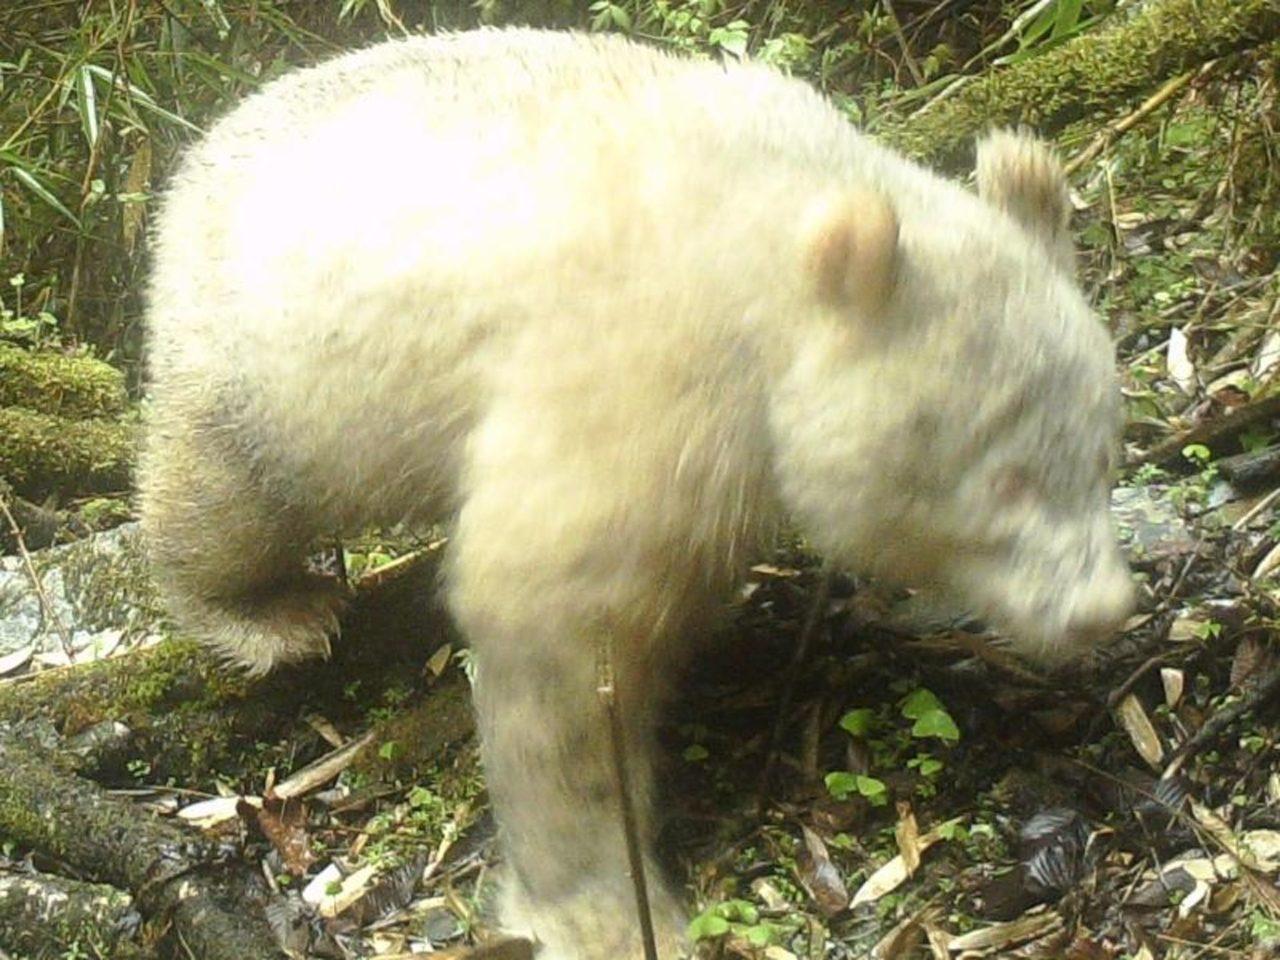 Albino-Panda in Wolong National Nature Reserve in Sichuan, China